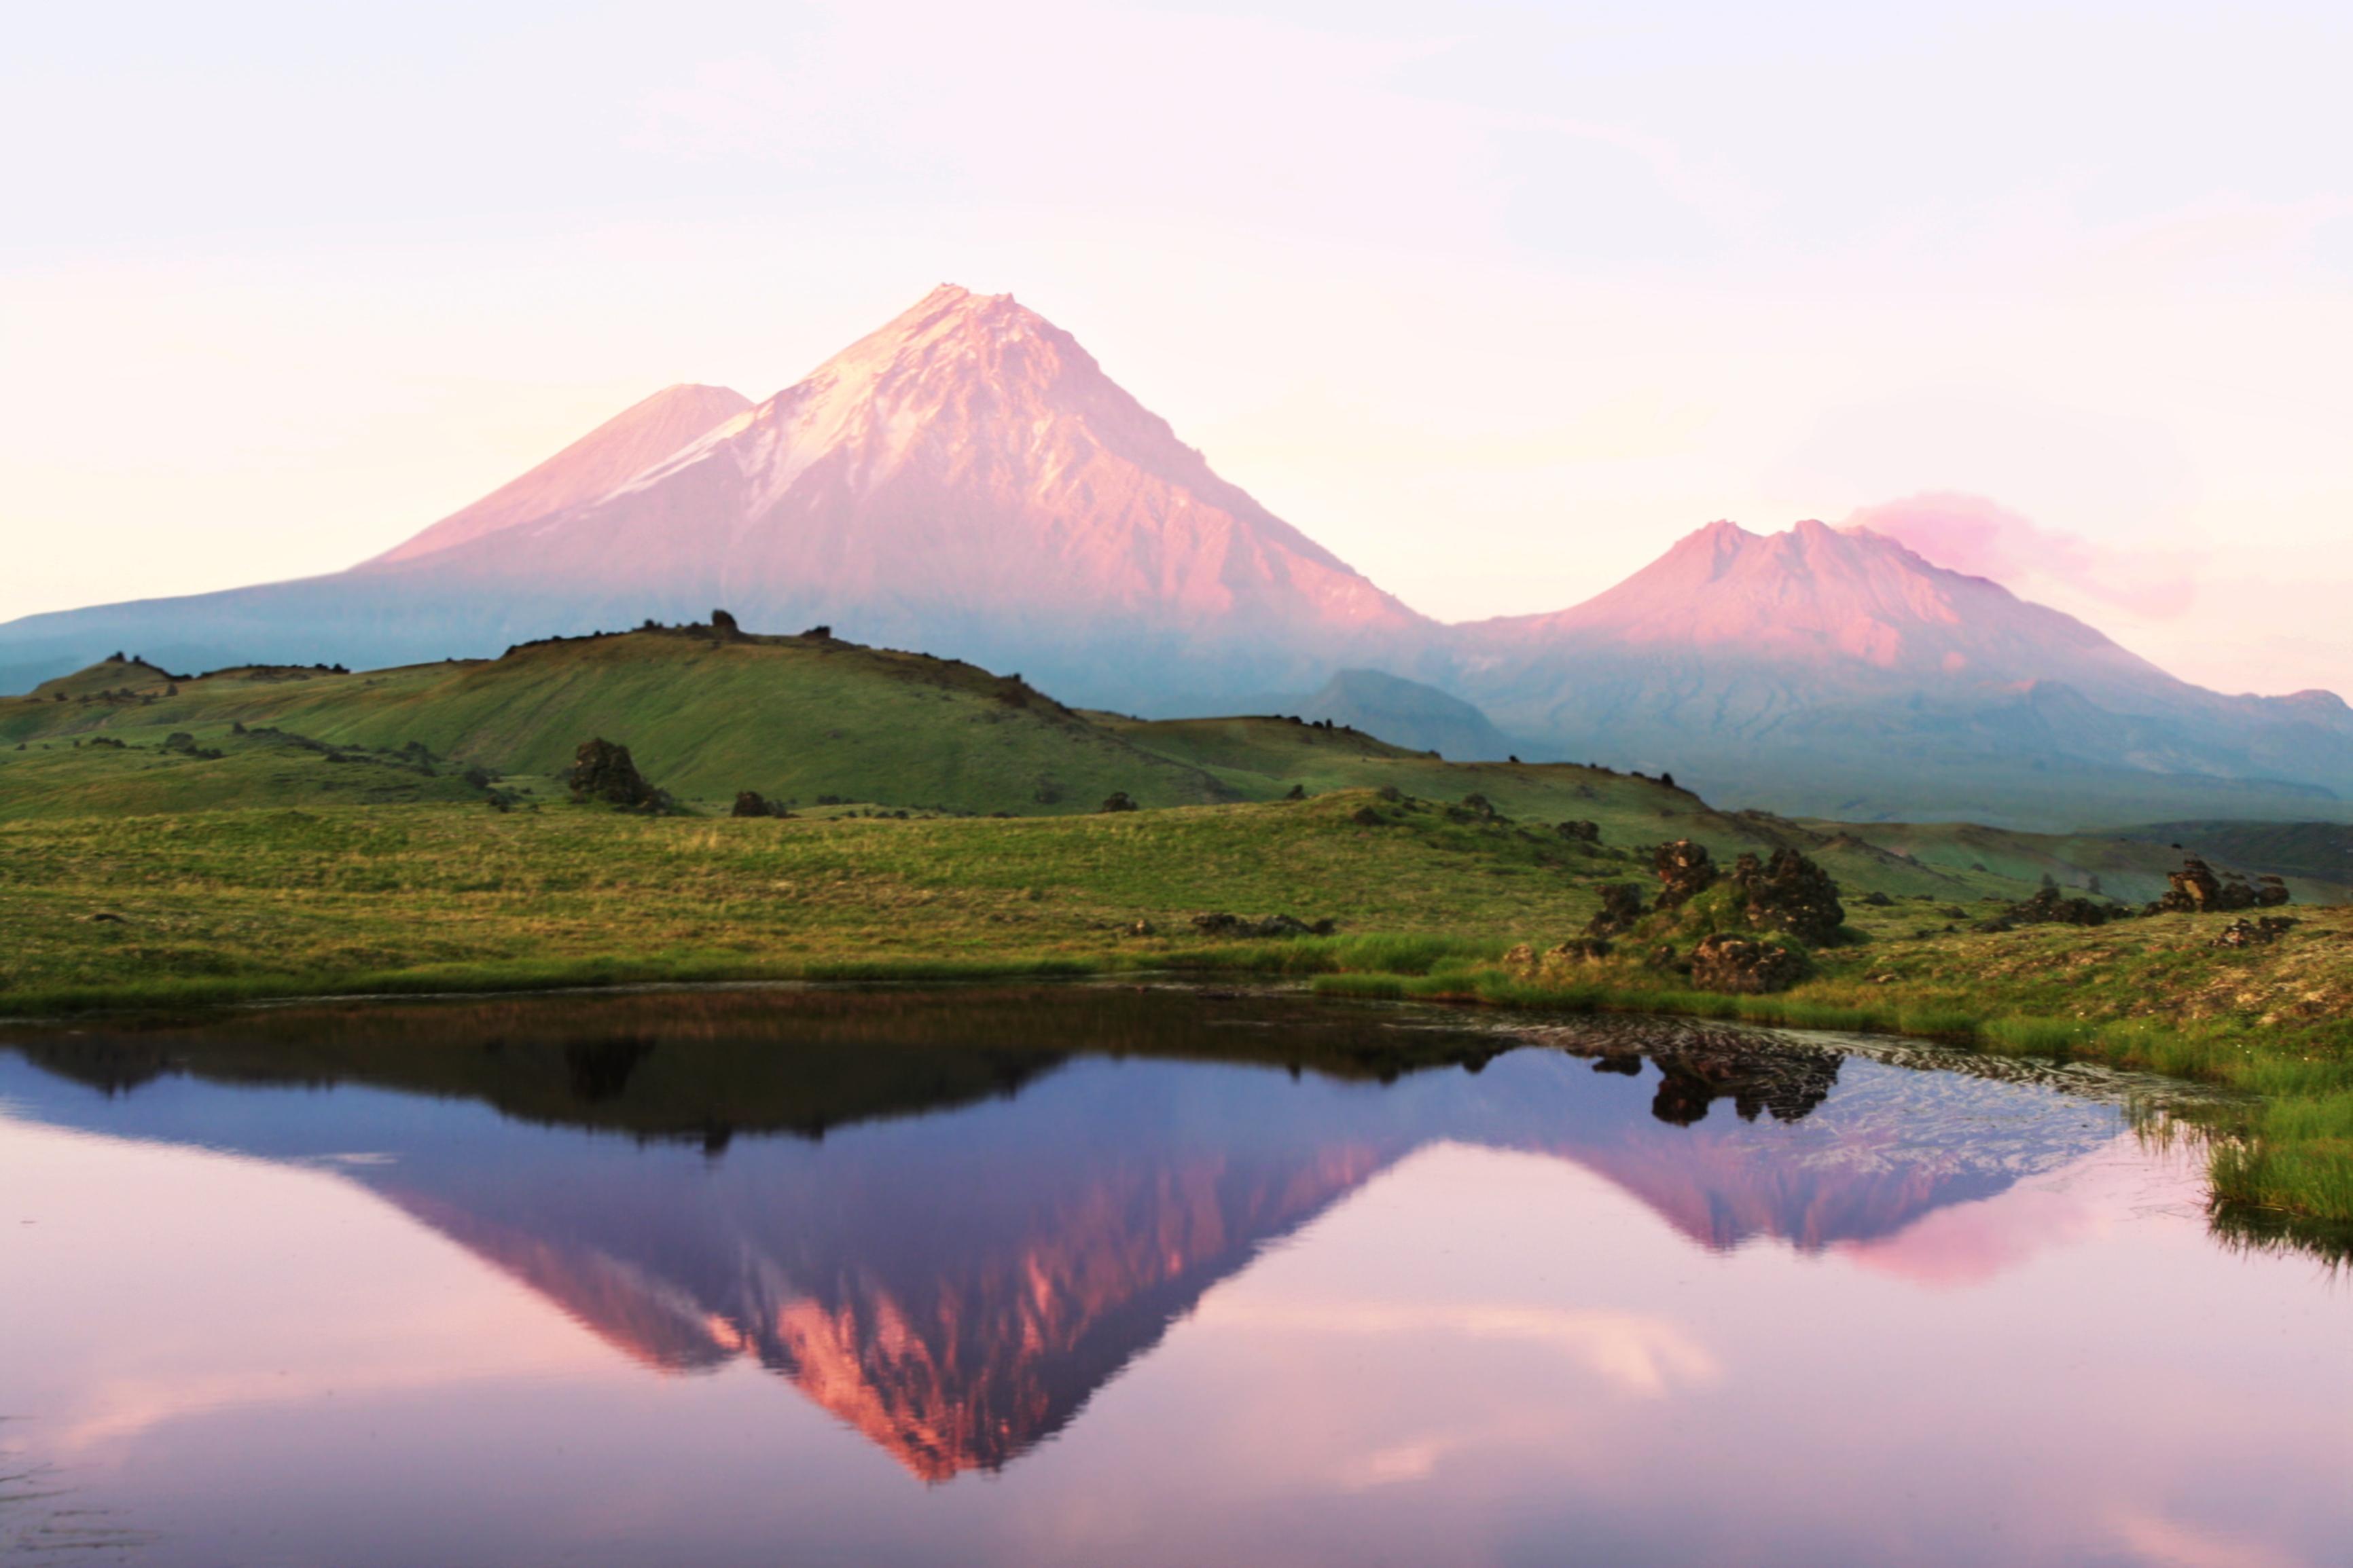 Dreamstime © - Kamchatka - Volcan de Moutnovsky (6)